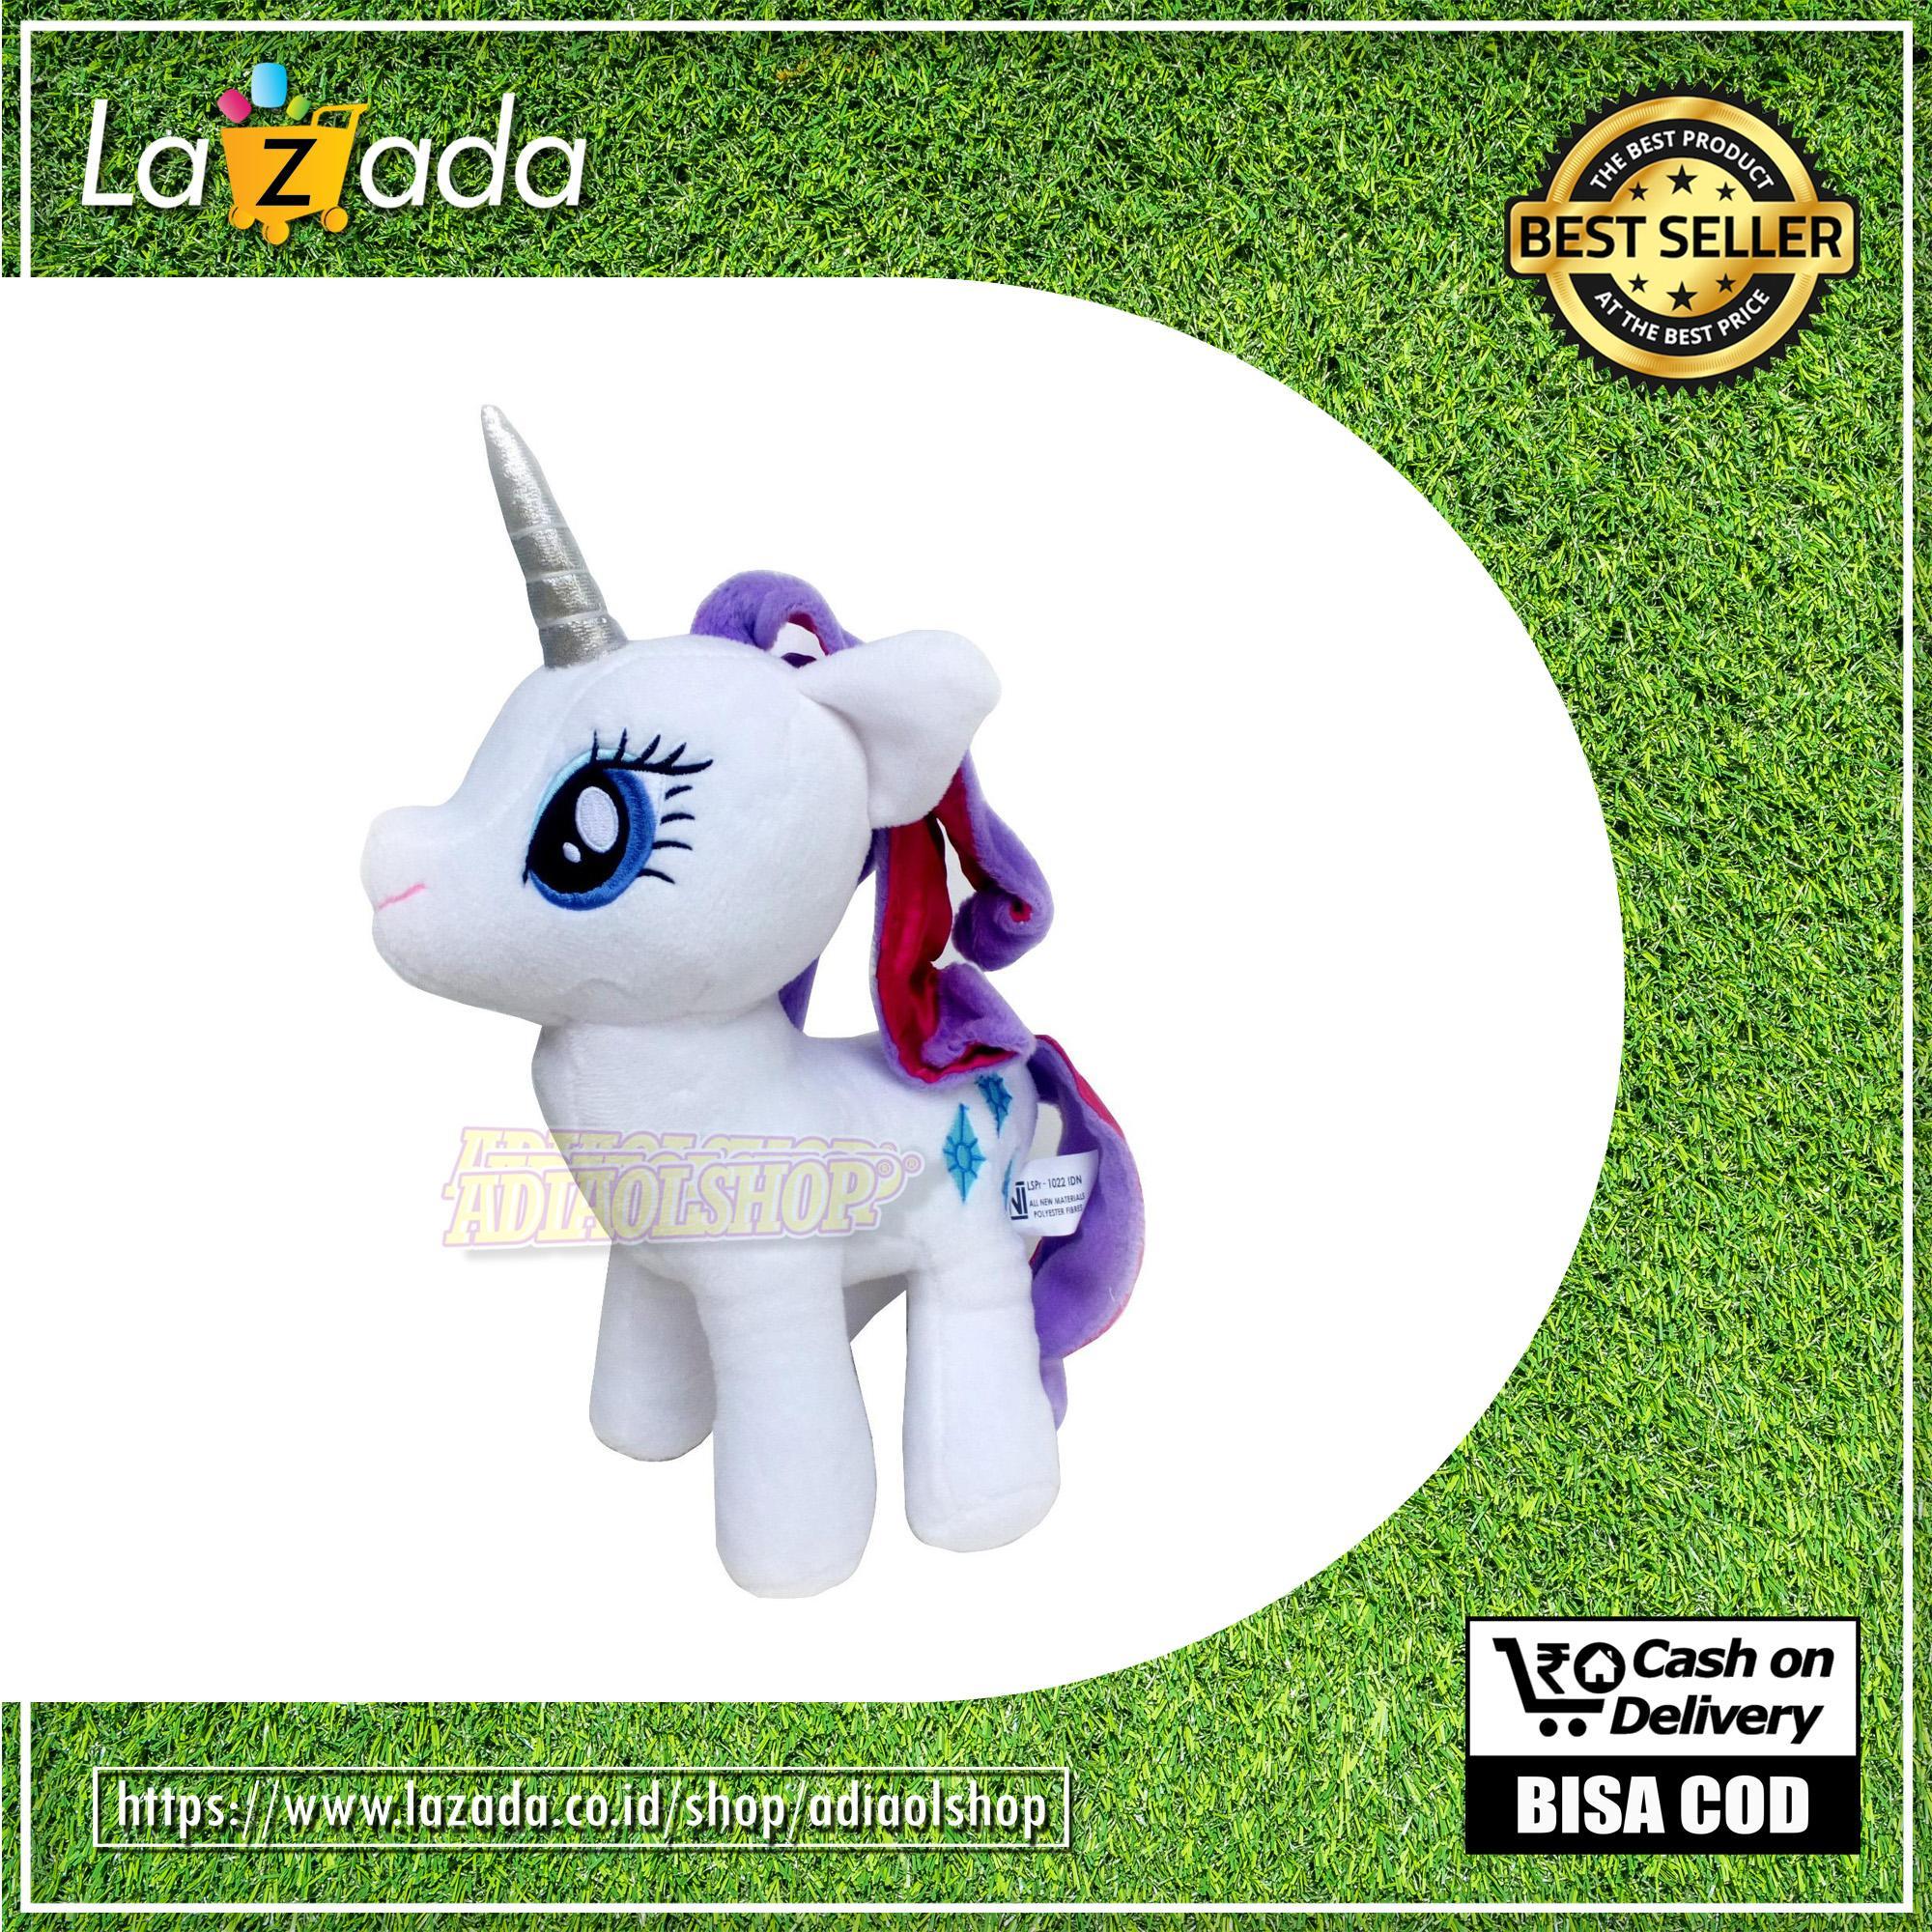 Bisa Cod - Ready Stock Boneka Kuda Poni My Little Pony Karakter High Quality (pilih Sesuai Warna Di Dropdown Warna) By Adiaolshop.